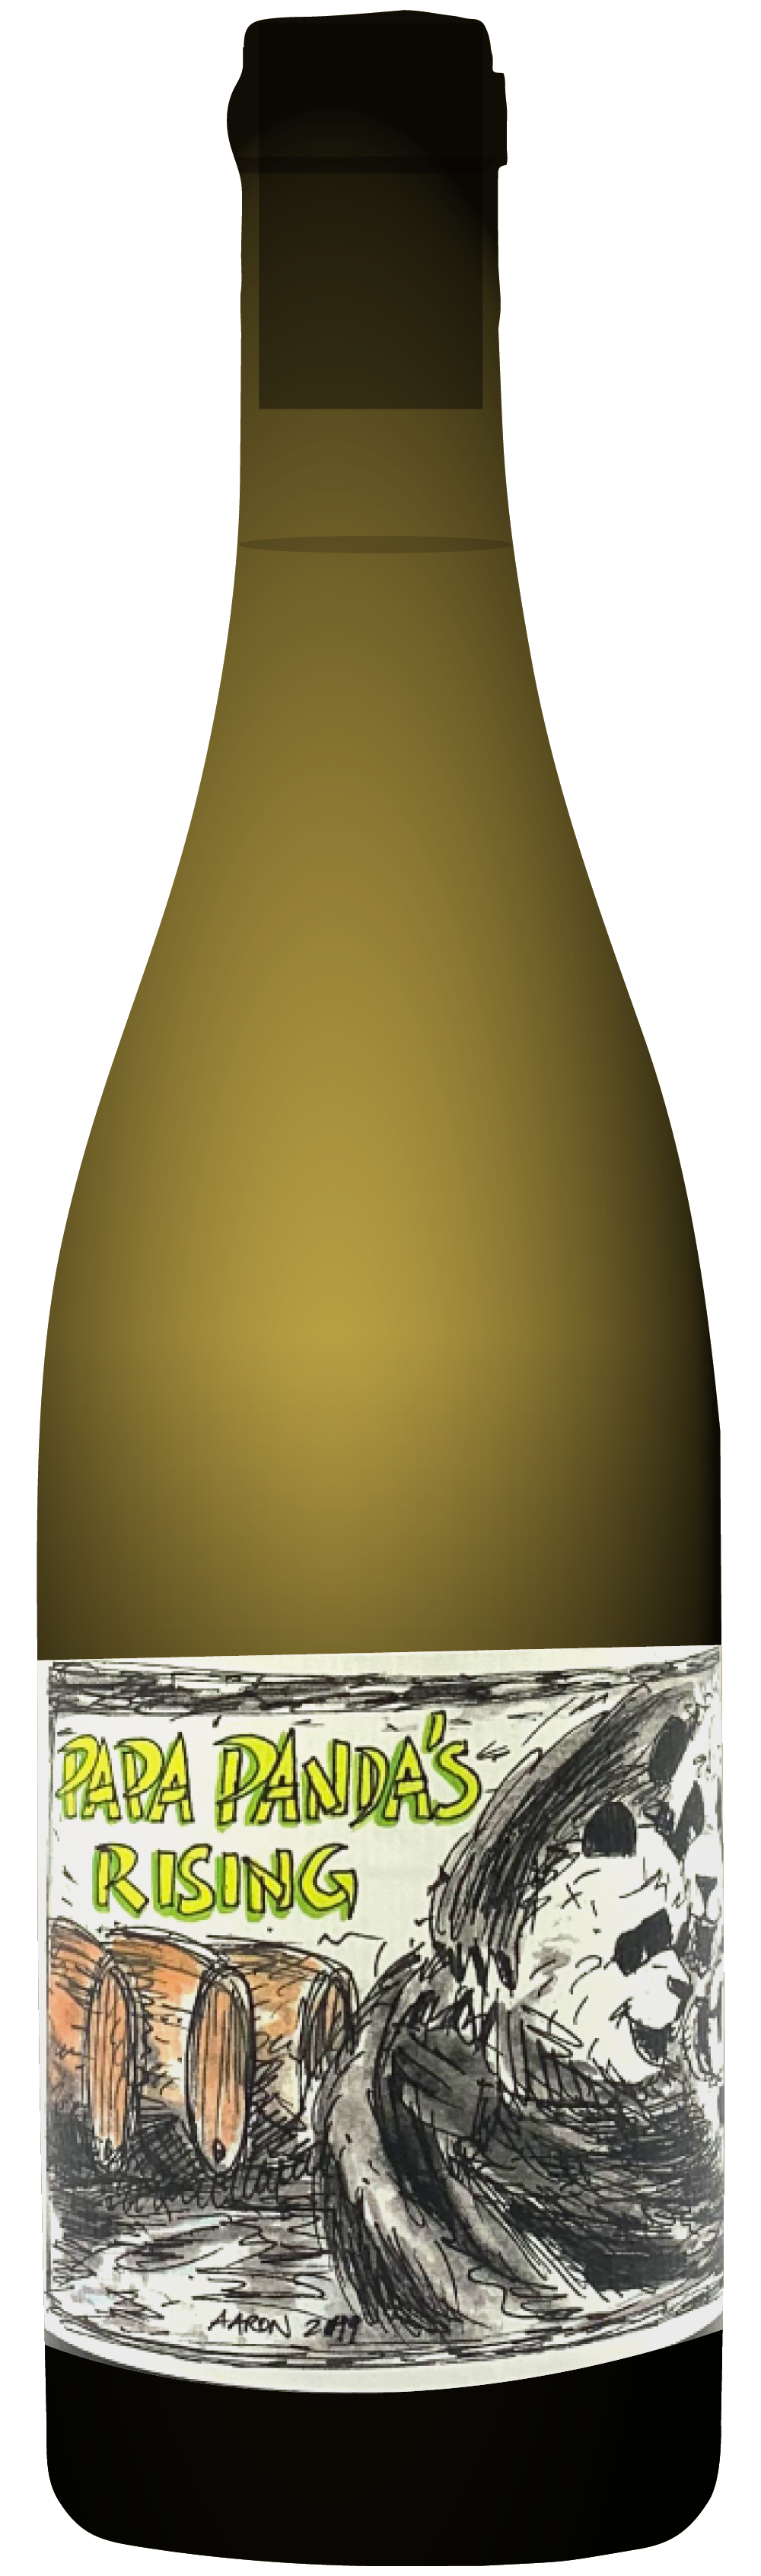 the natural wine company club december 2020 germany staffelter hof papa panda rising 2